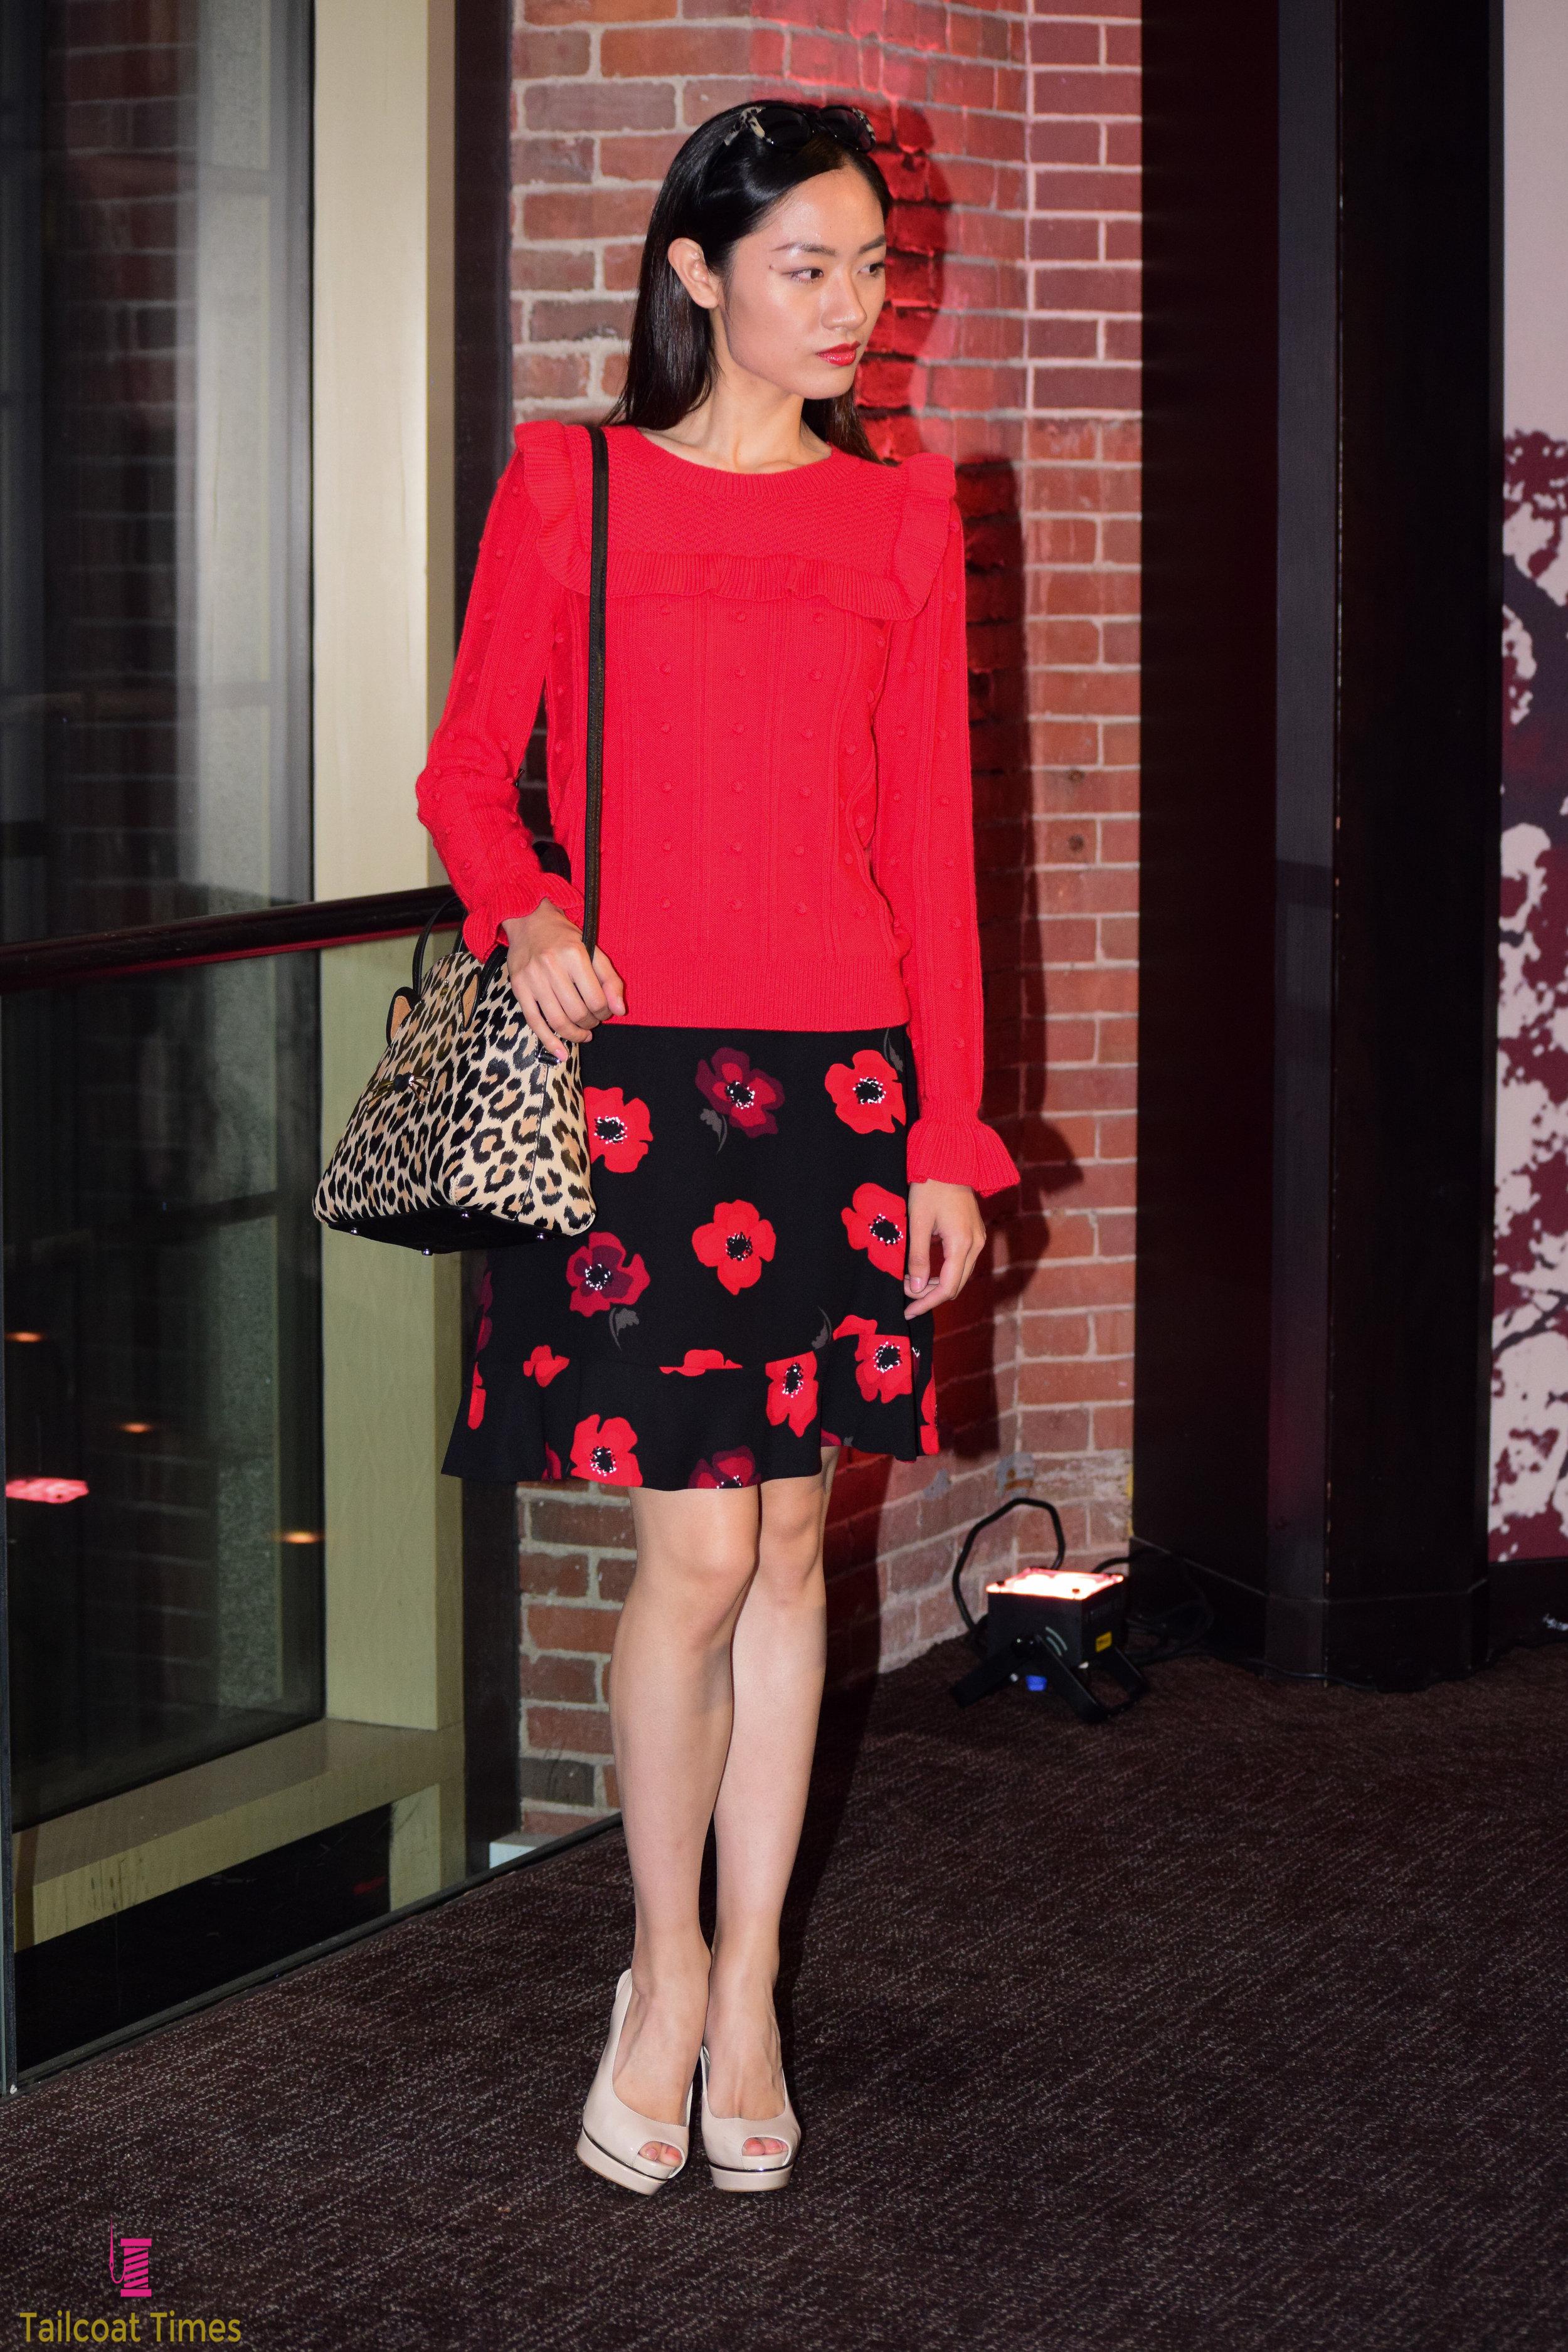 FashionablyLate_Kate Spade_Tailcoat Times (1 of 23).jpg